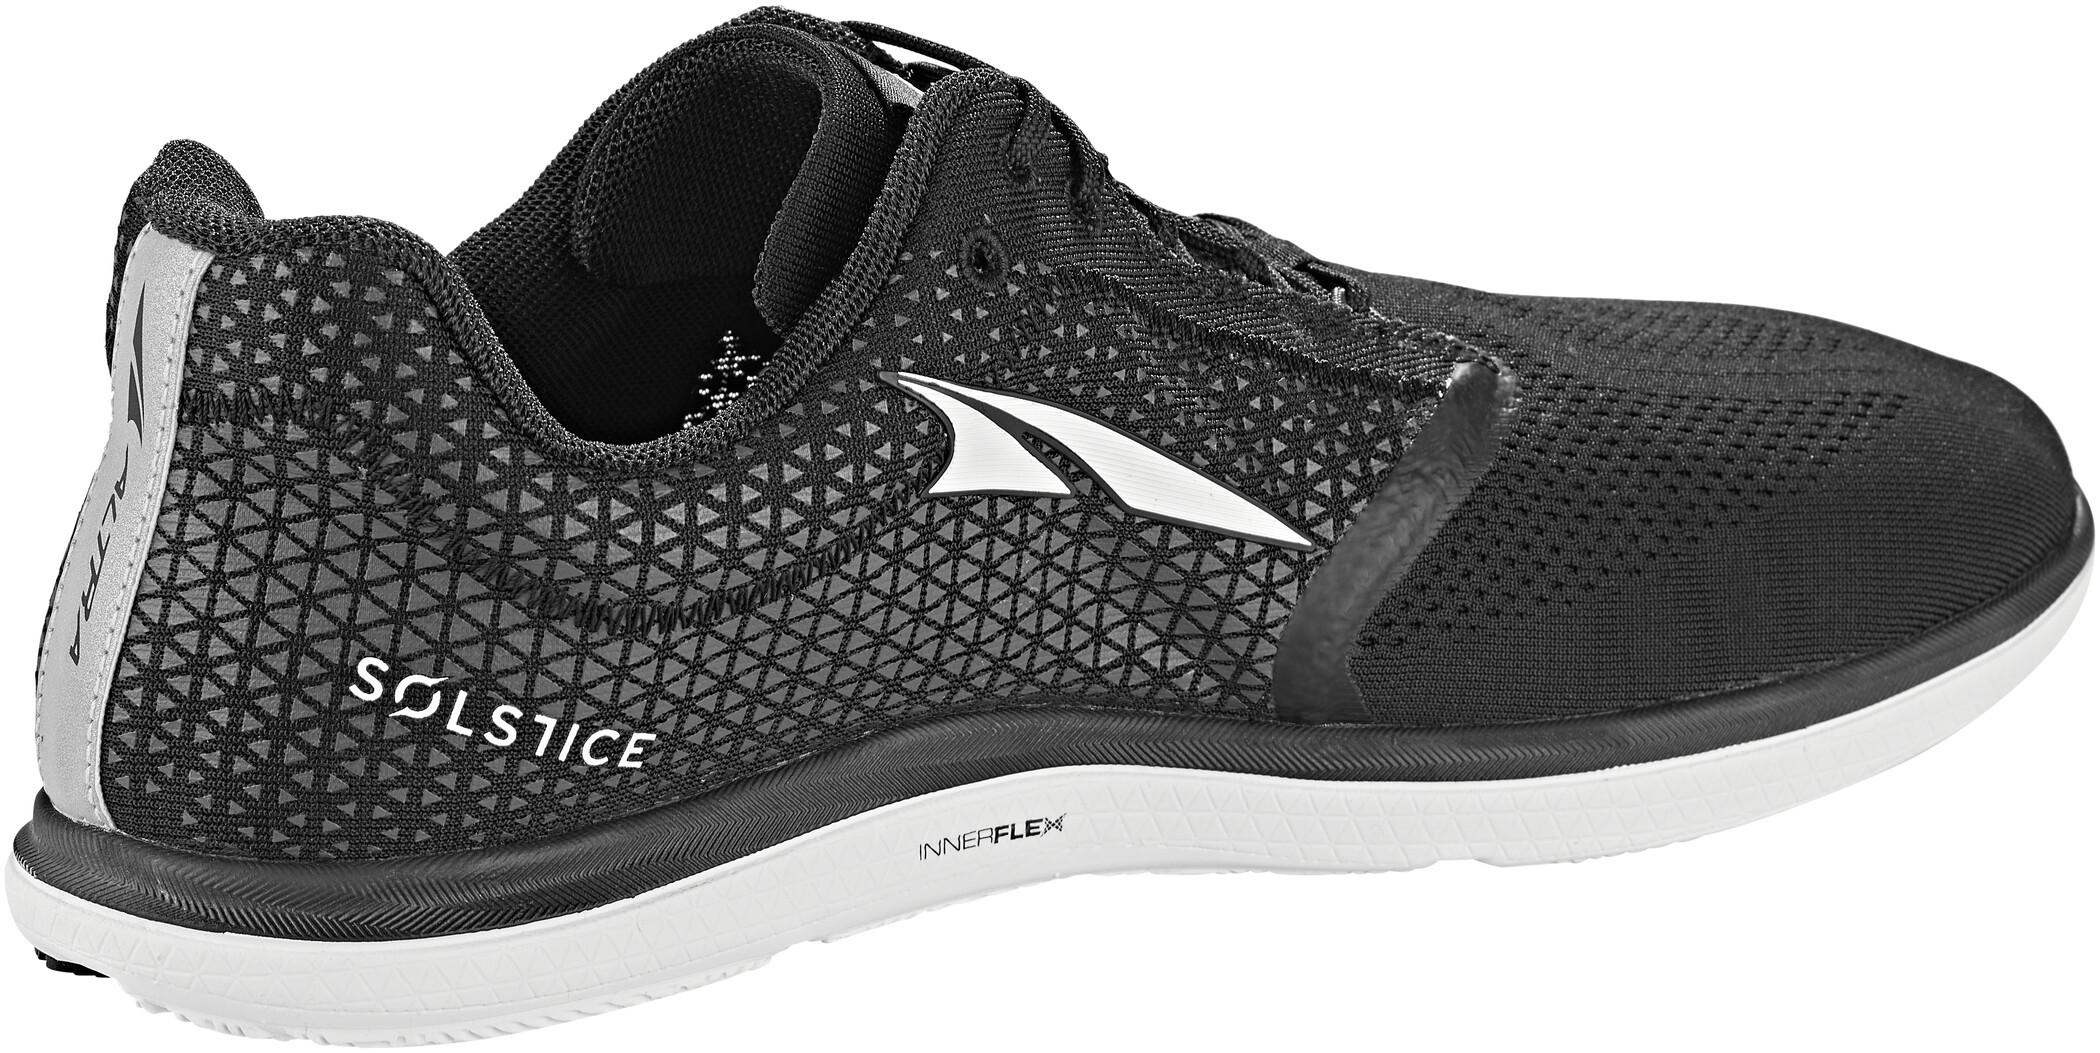 Altra Solstice Running Shoes Herr black